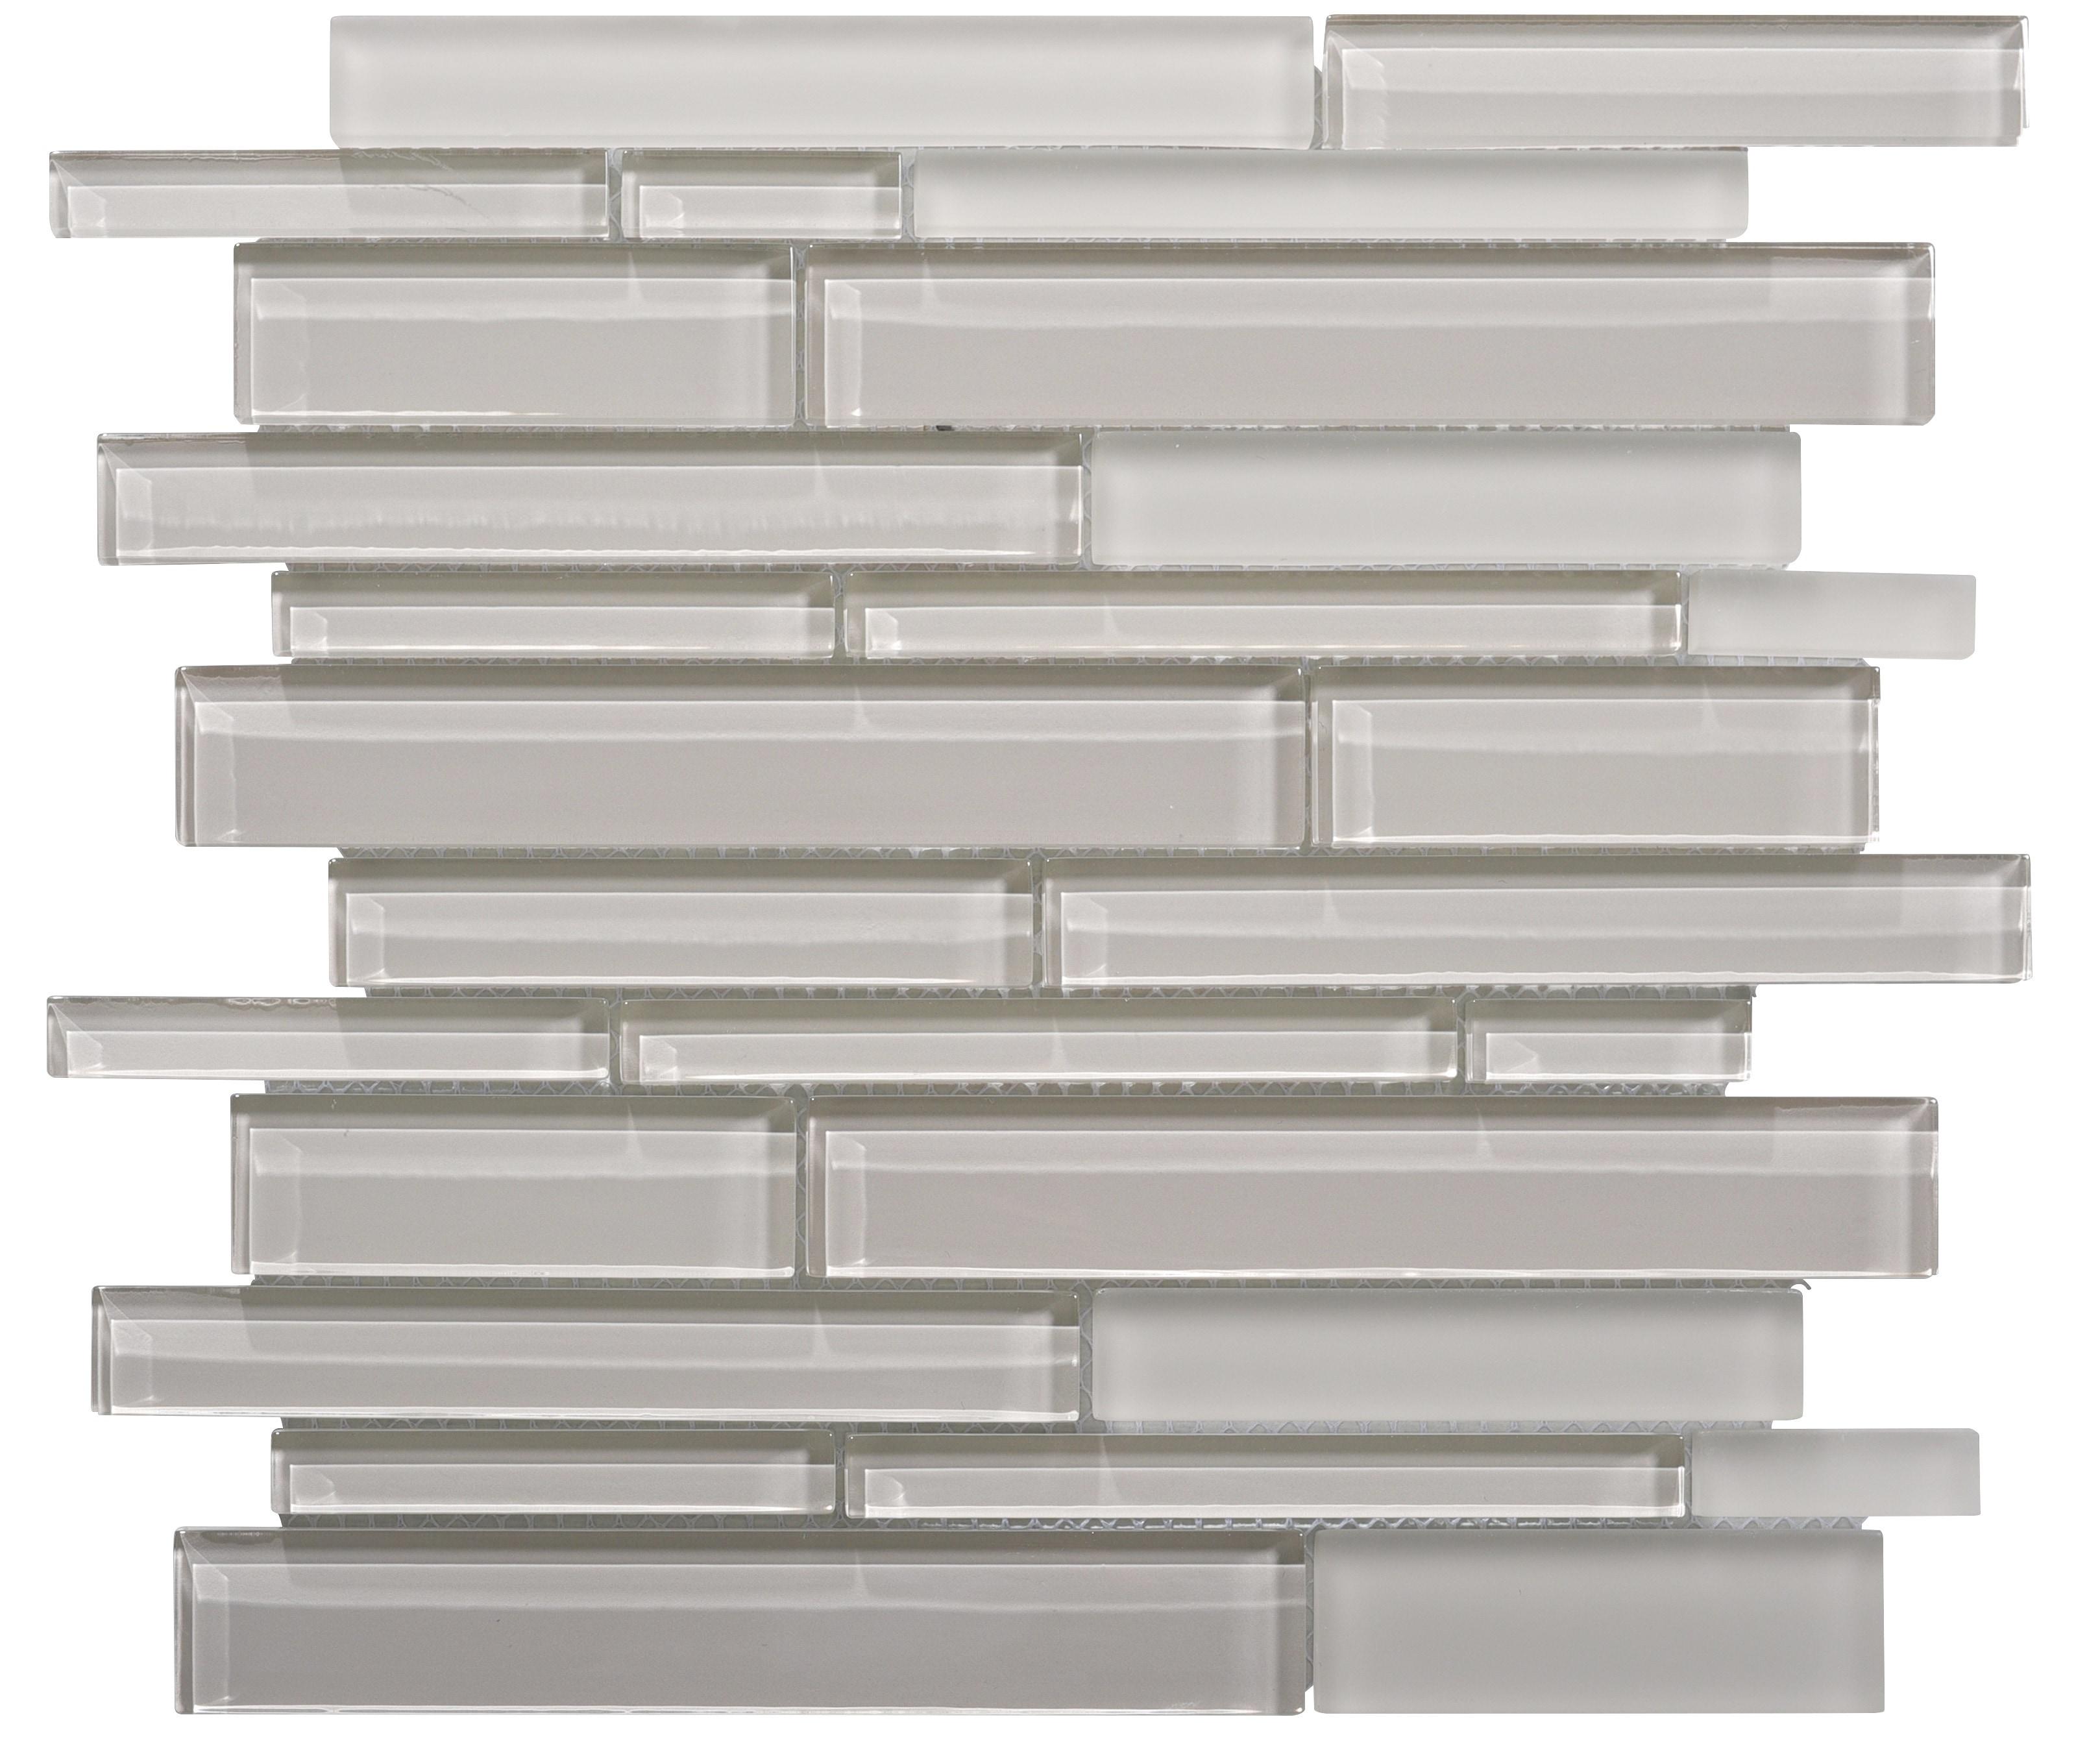 Glass Mosaic / 14 x 12 x 0.31 inches / Glossy Interlocking Random Sized Glass Mosaic Tile In Icy Gray 0